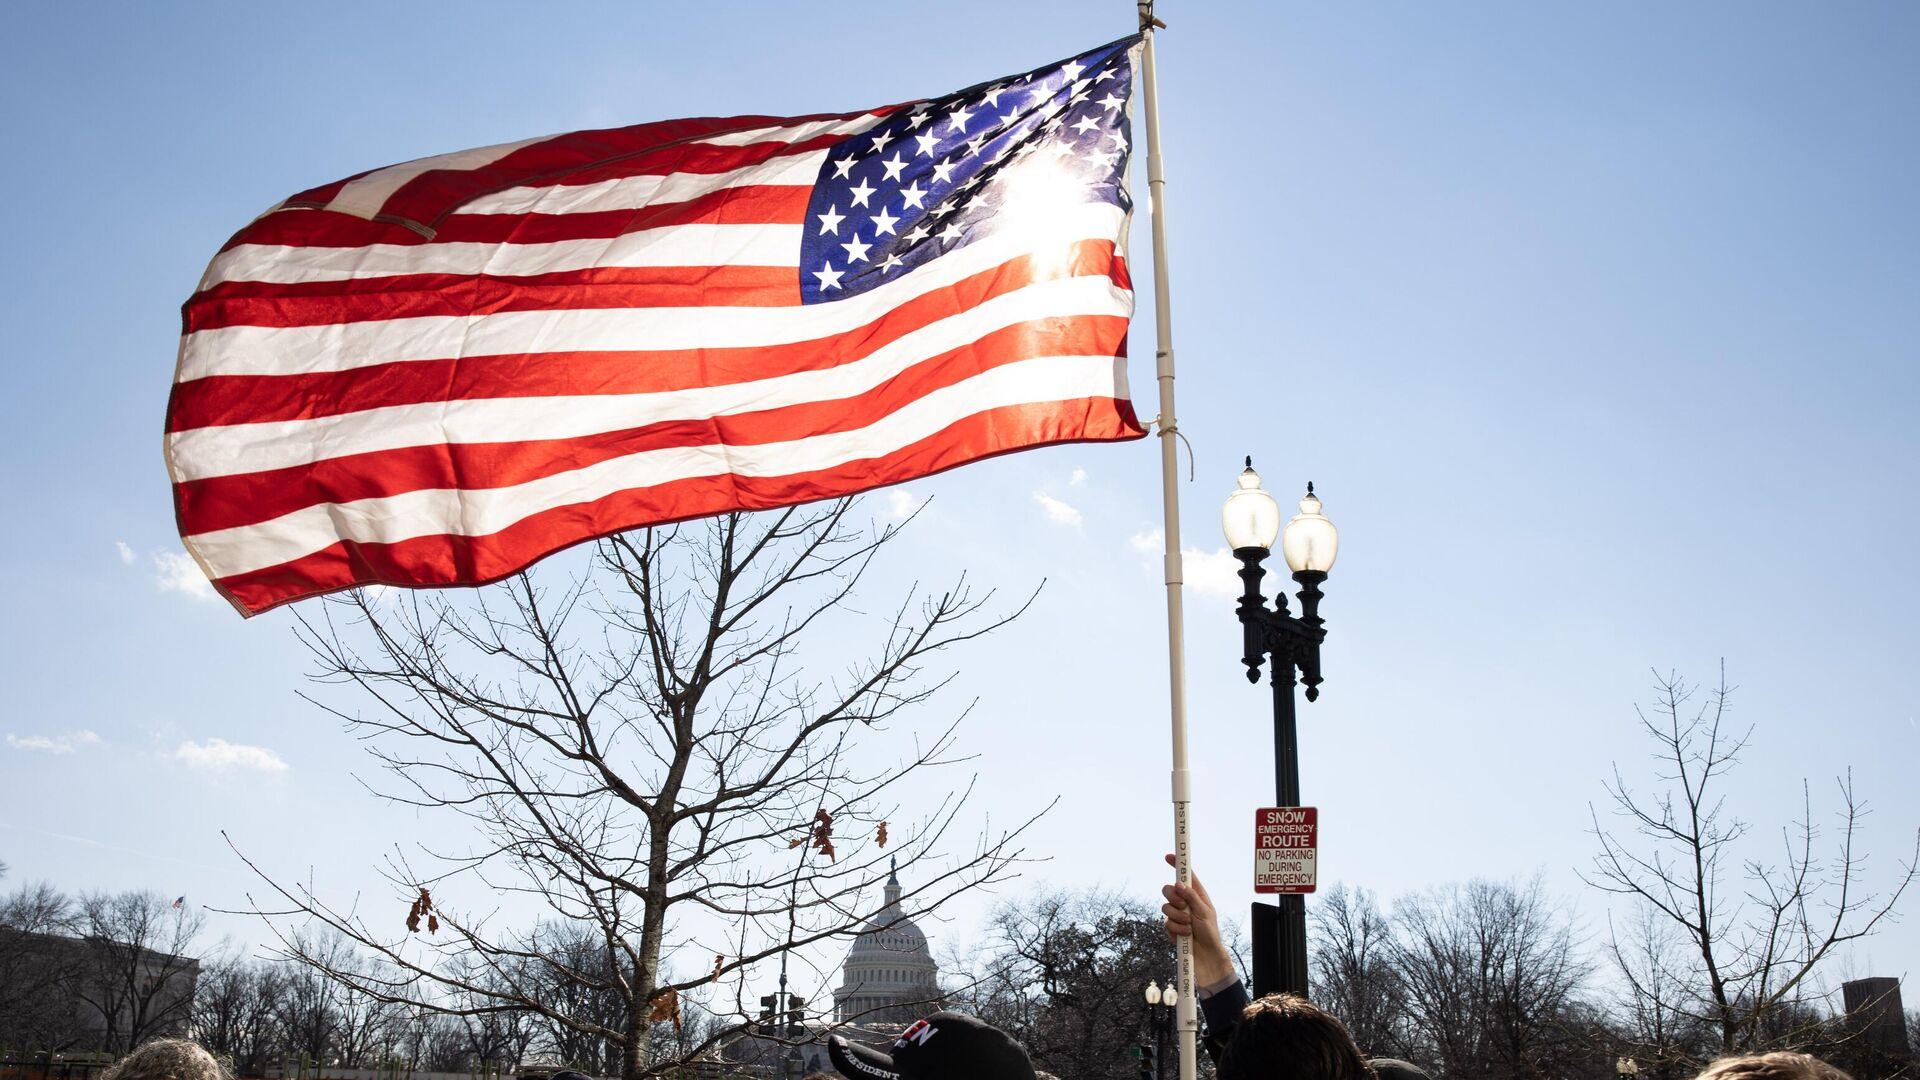 Американский флаг возле здания Капитолия США во время инаугурации избранного президента Джо Байдена - РИА Новости, 1920, 31.03.2021